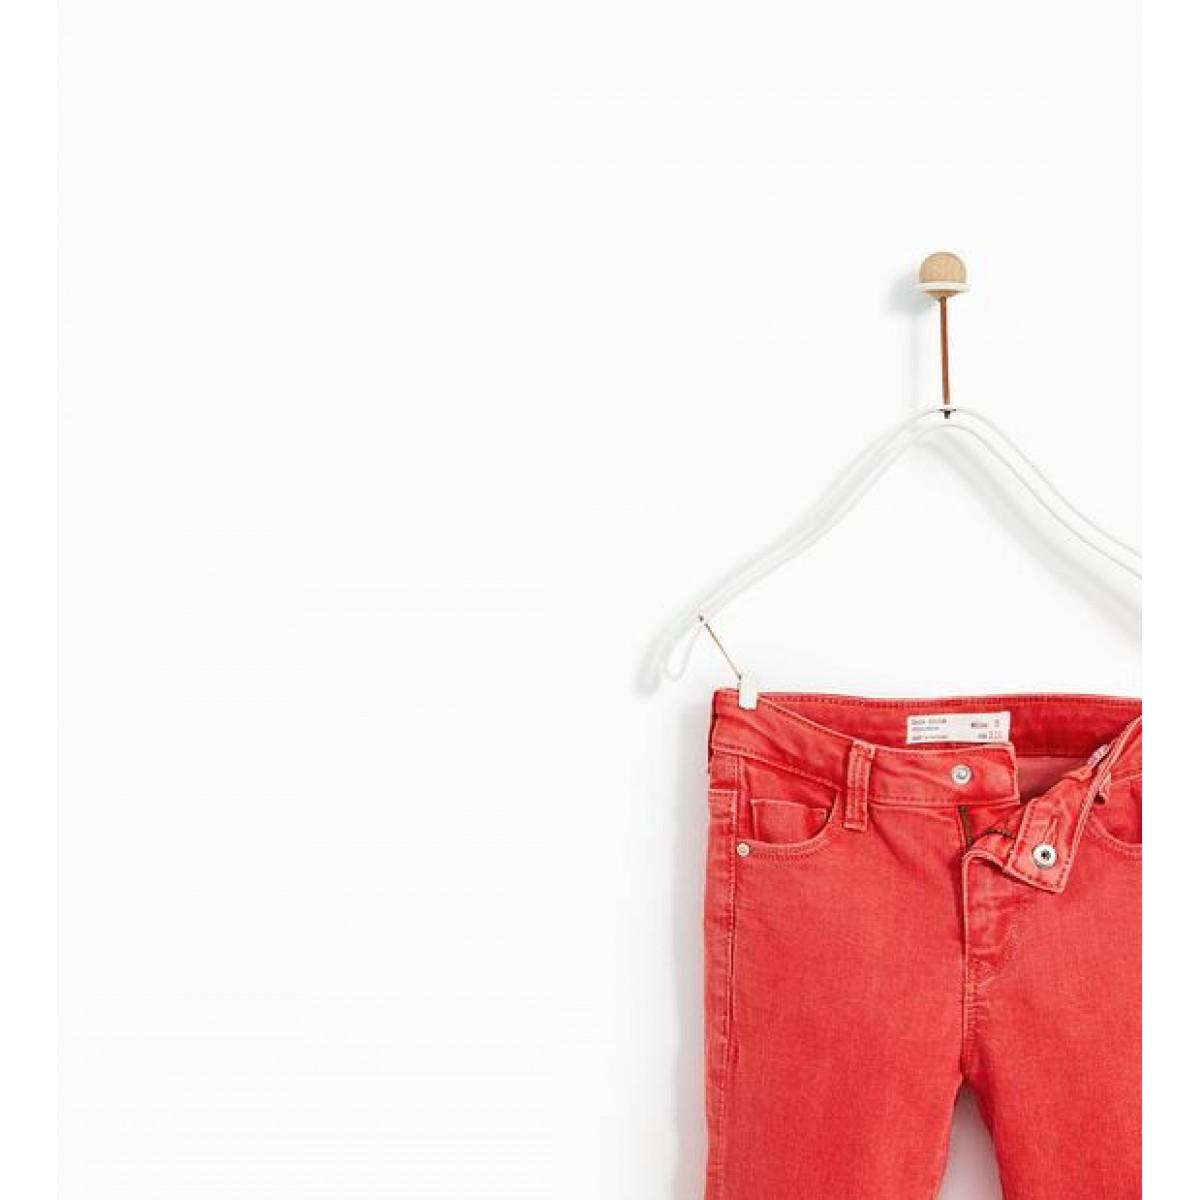 Zara Twill Trousers